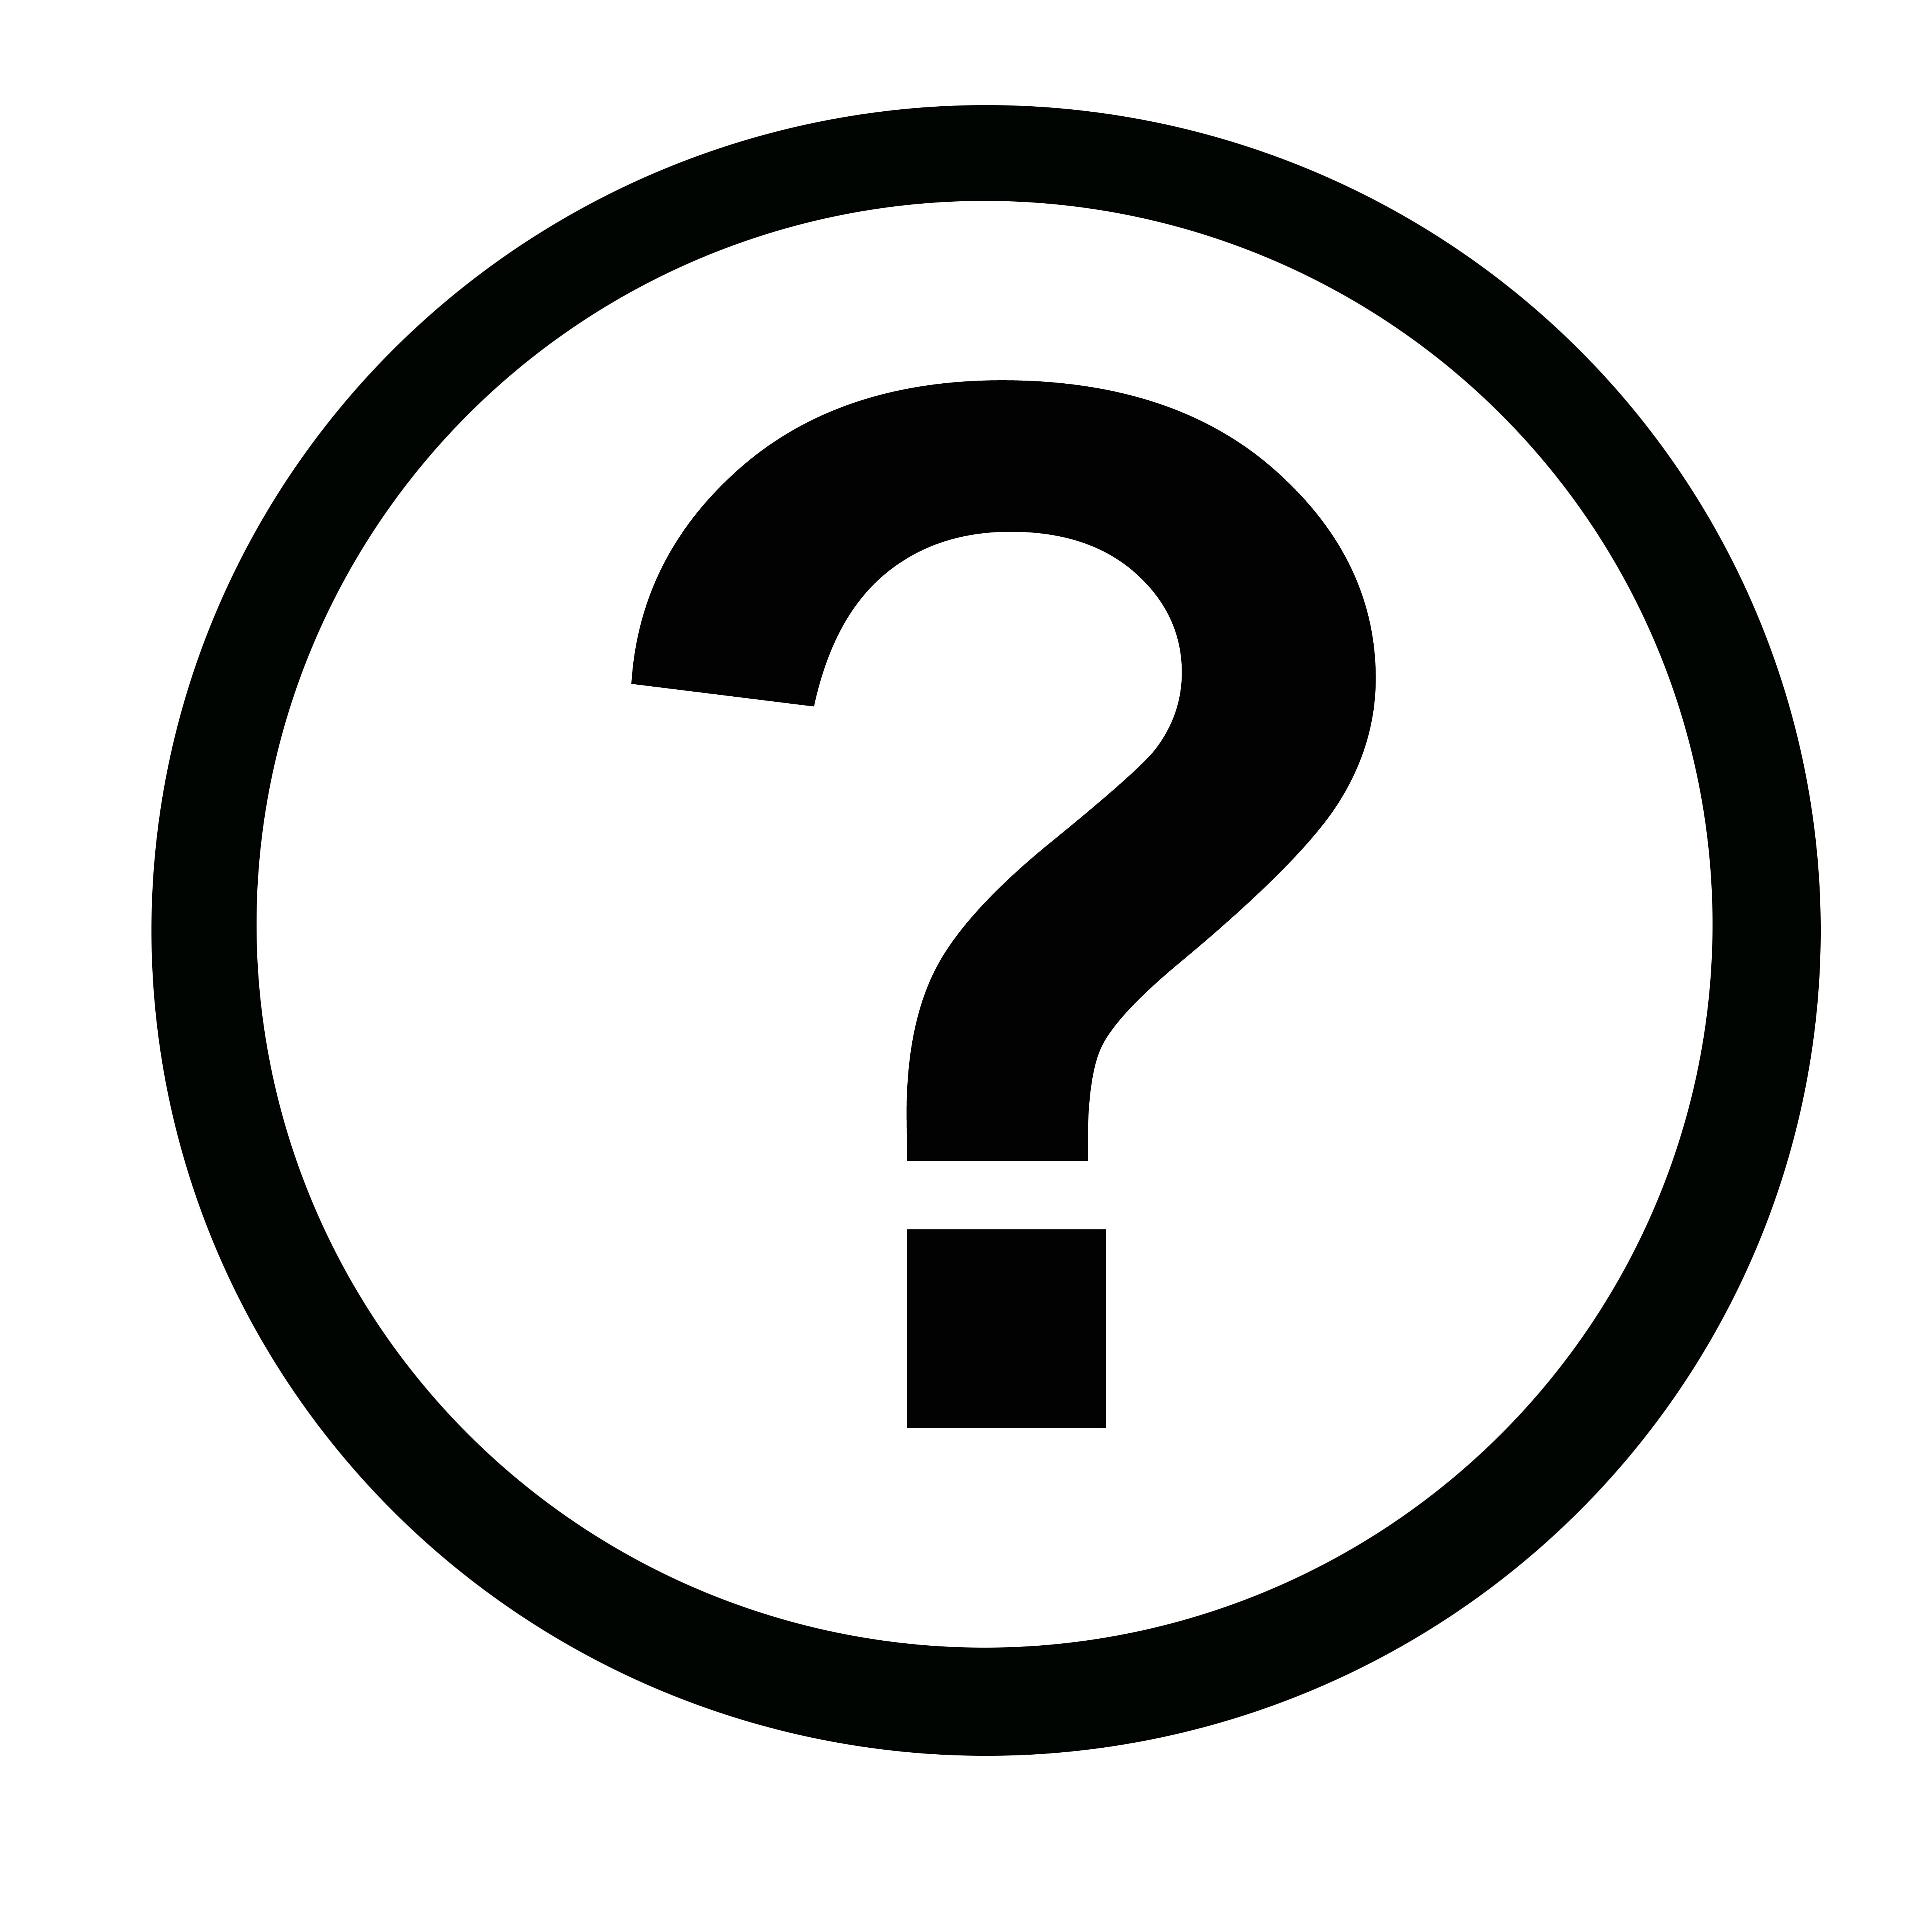 Question Mark Clip Art Black And White.